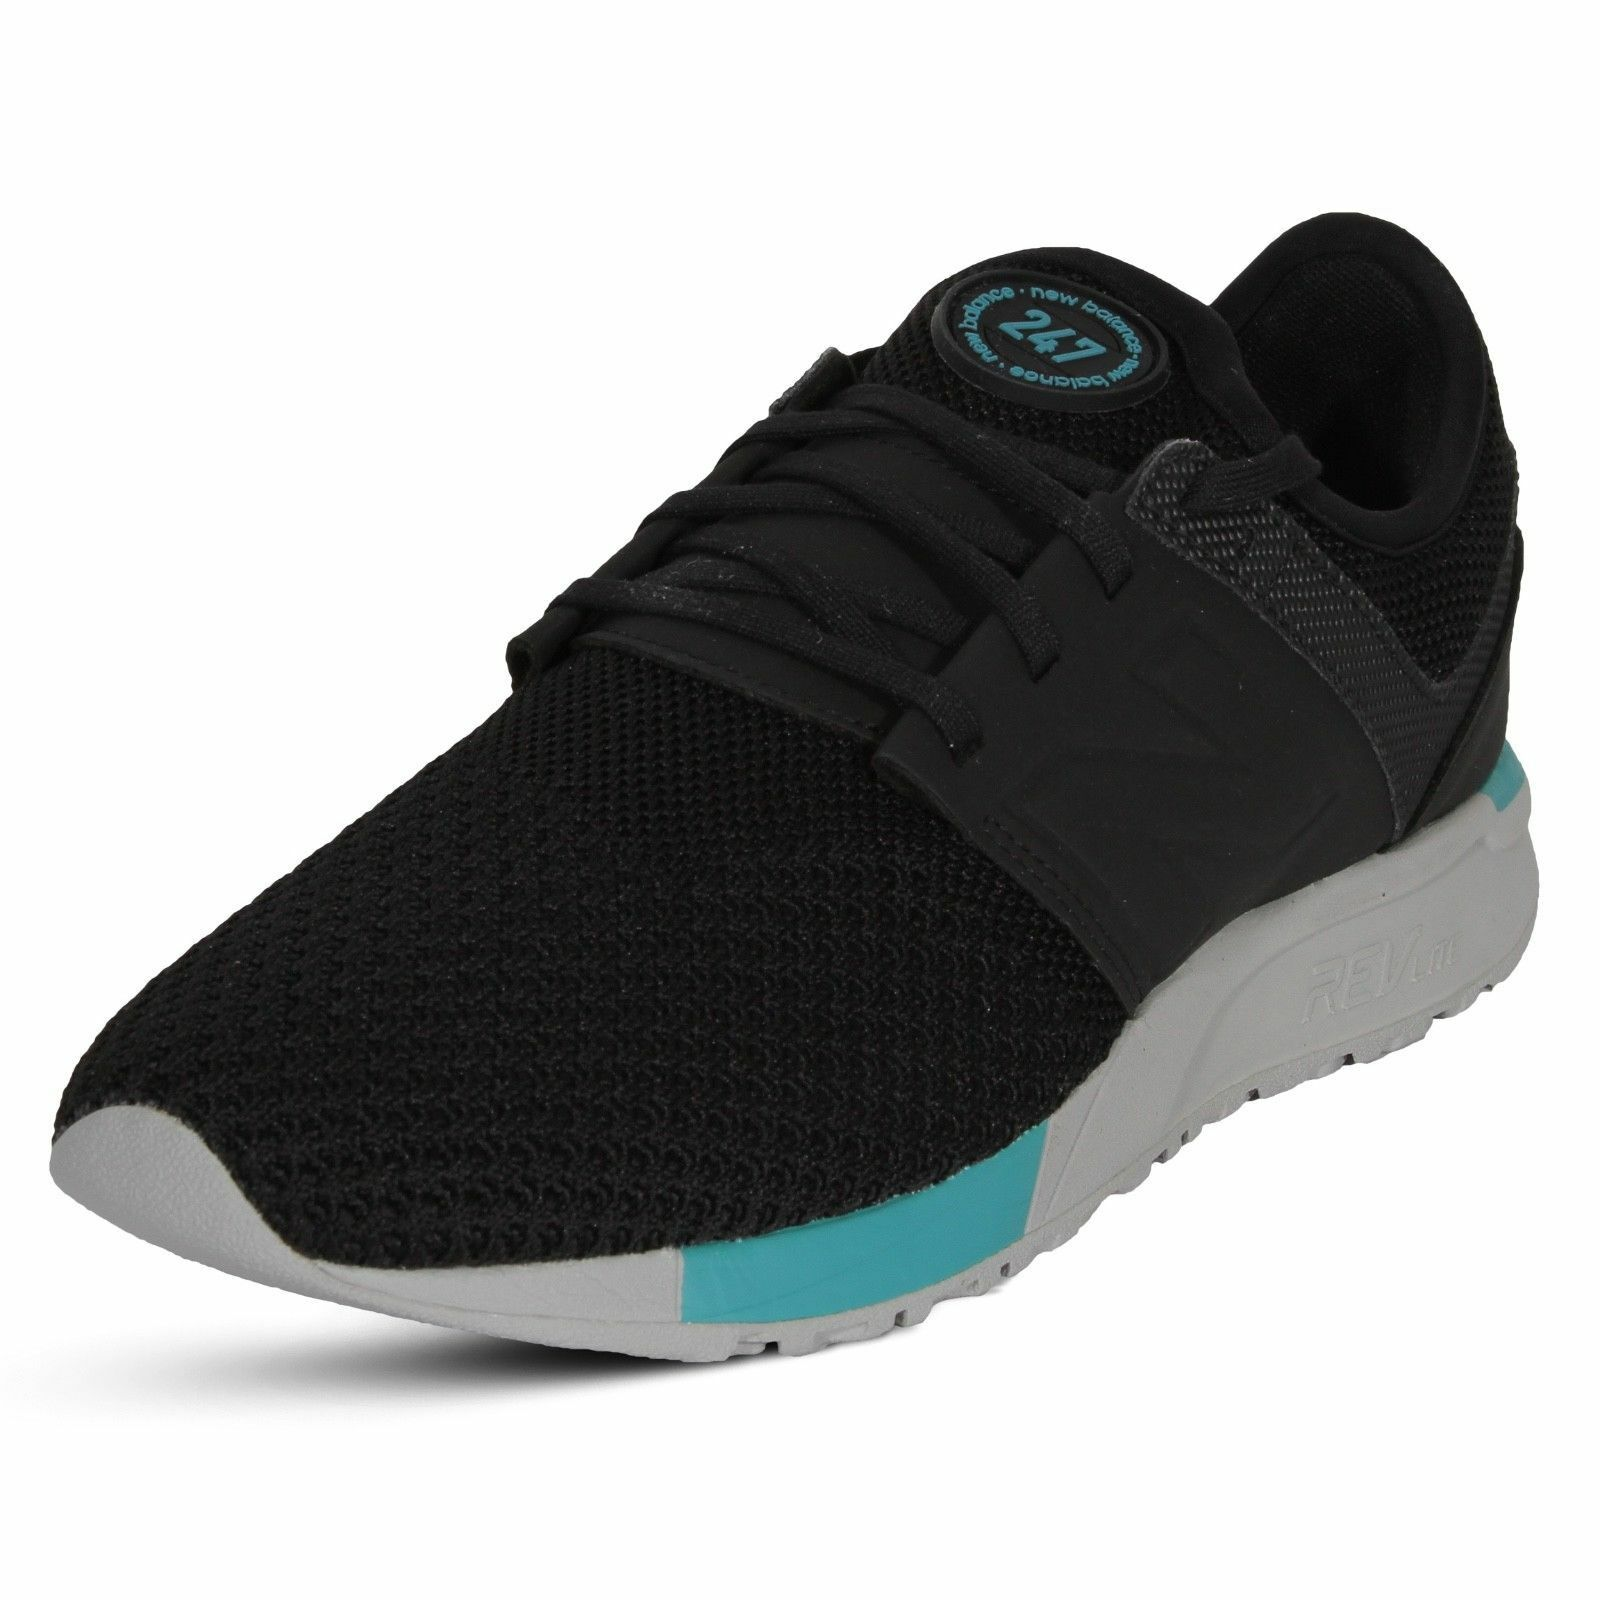 2018 clásico deportivo para hombre Tenis New Balance's con Cordones Tenis hombre Zapatos  MRL247KB Negro 96a4a9